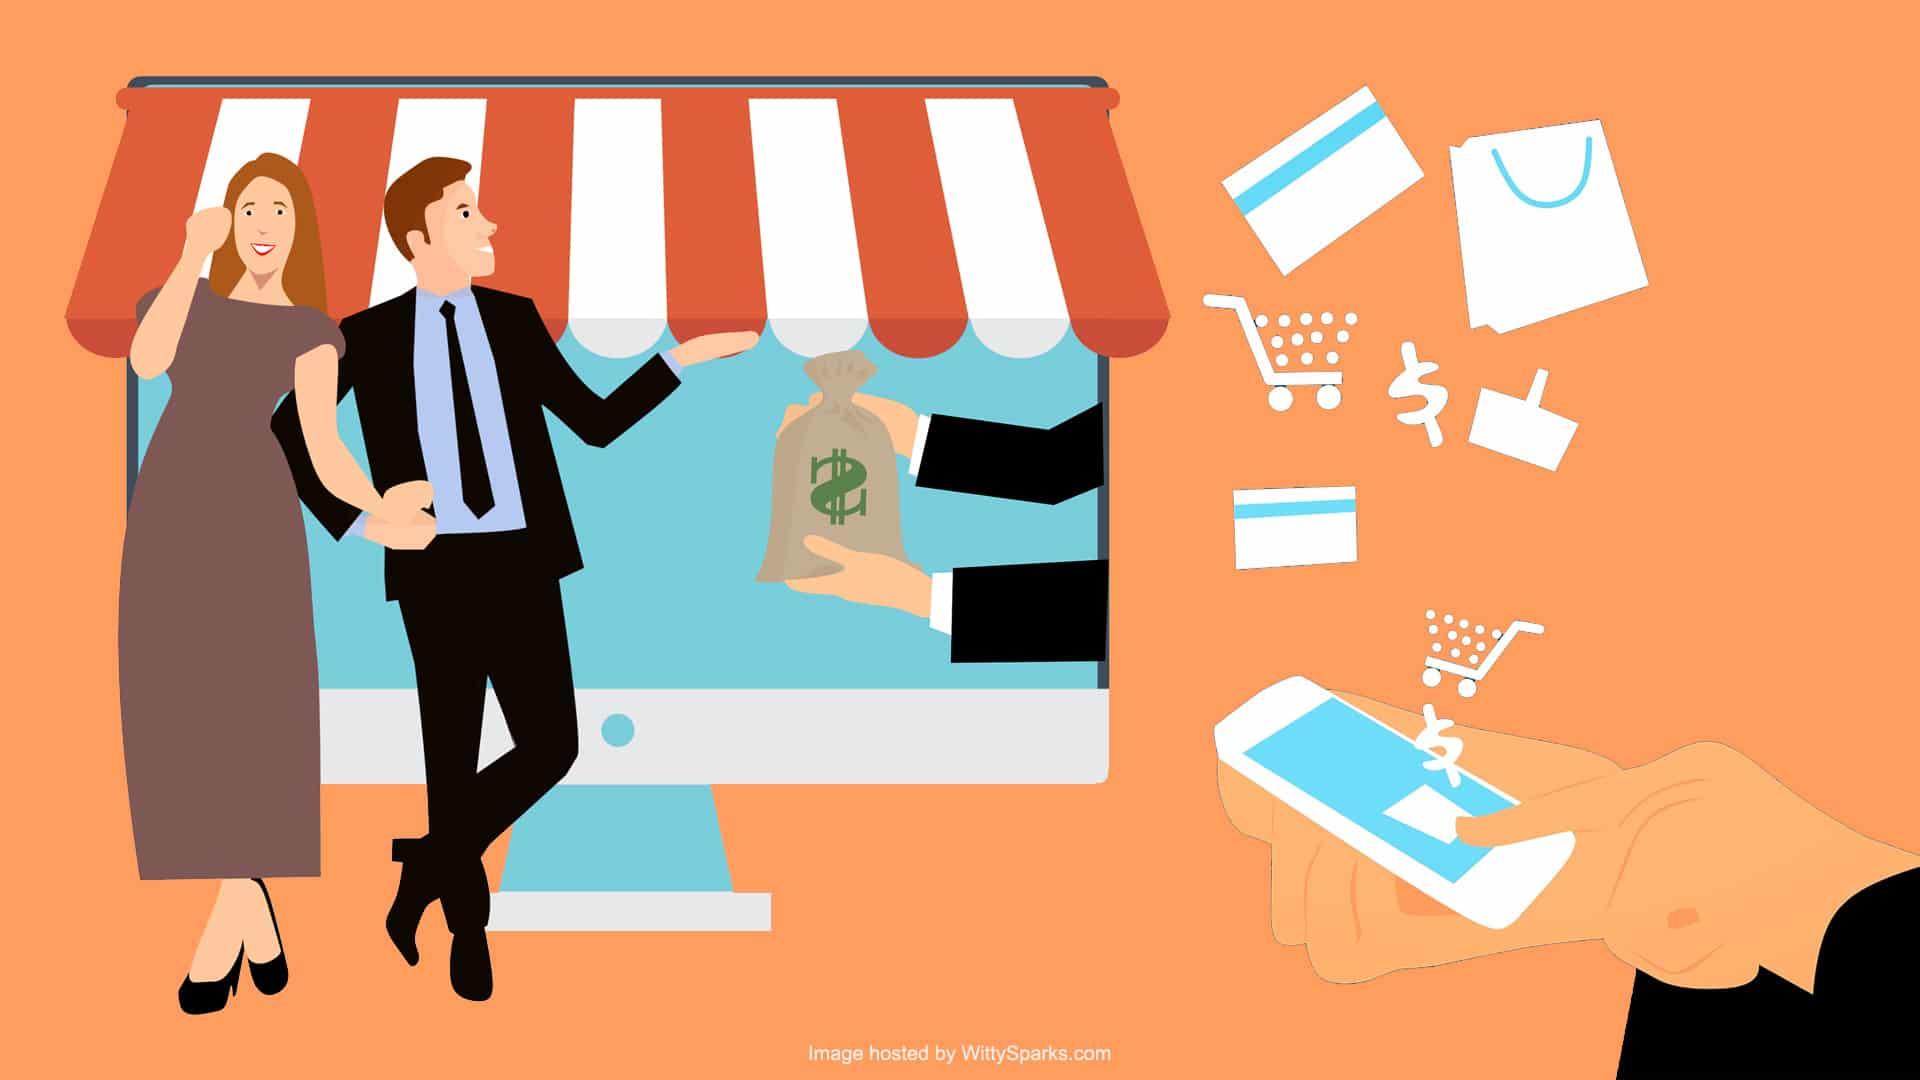 Mobile Vendor - Payment methods